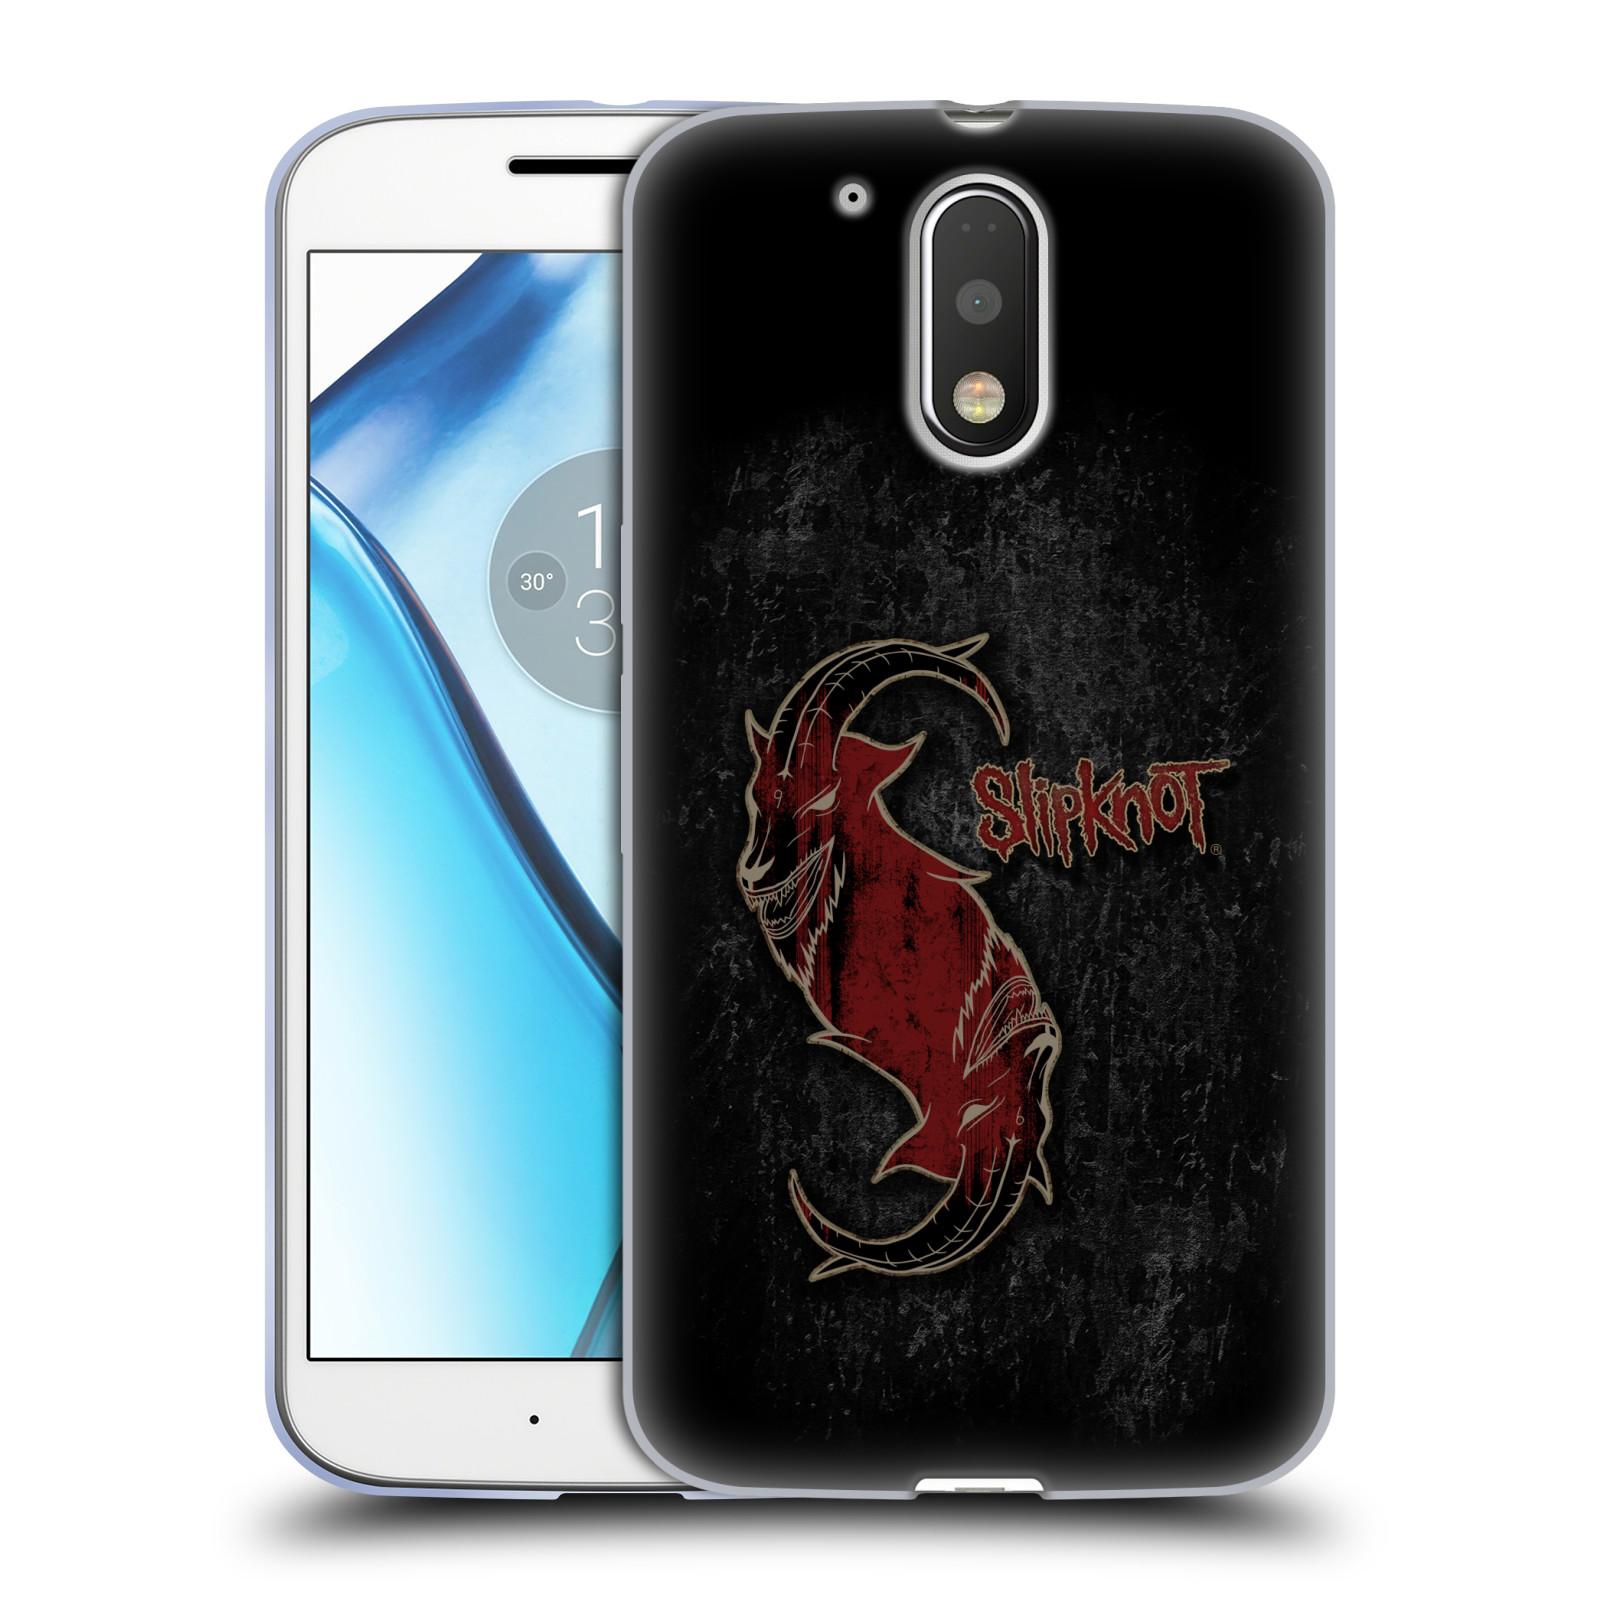 Silikonové pouzdro na mobil Lenovo Moto G4 HEAD CASE Slipknot - Rudý kozel